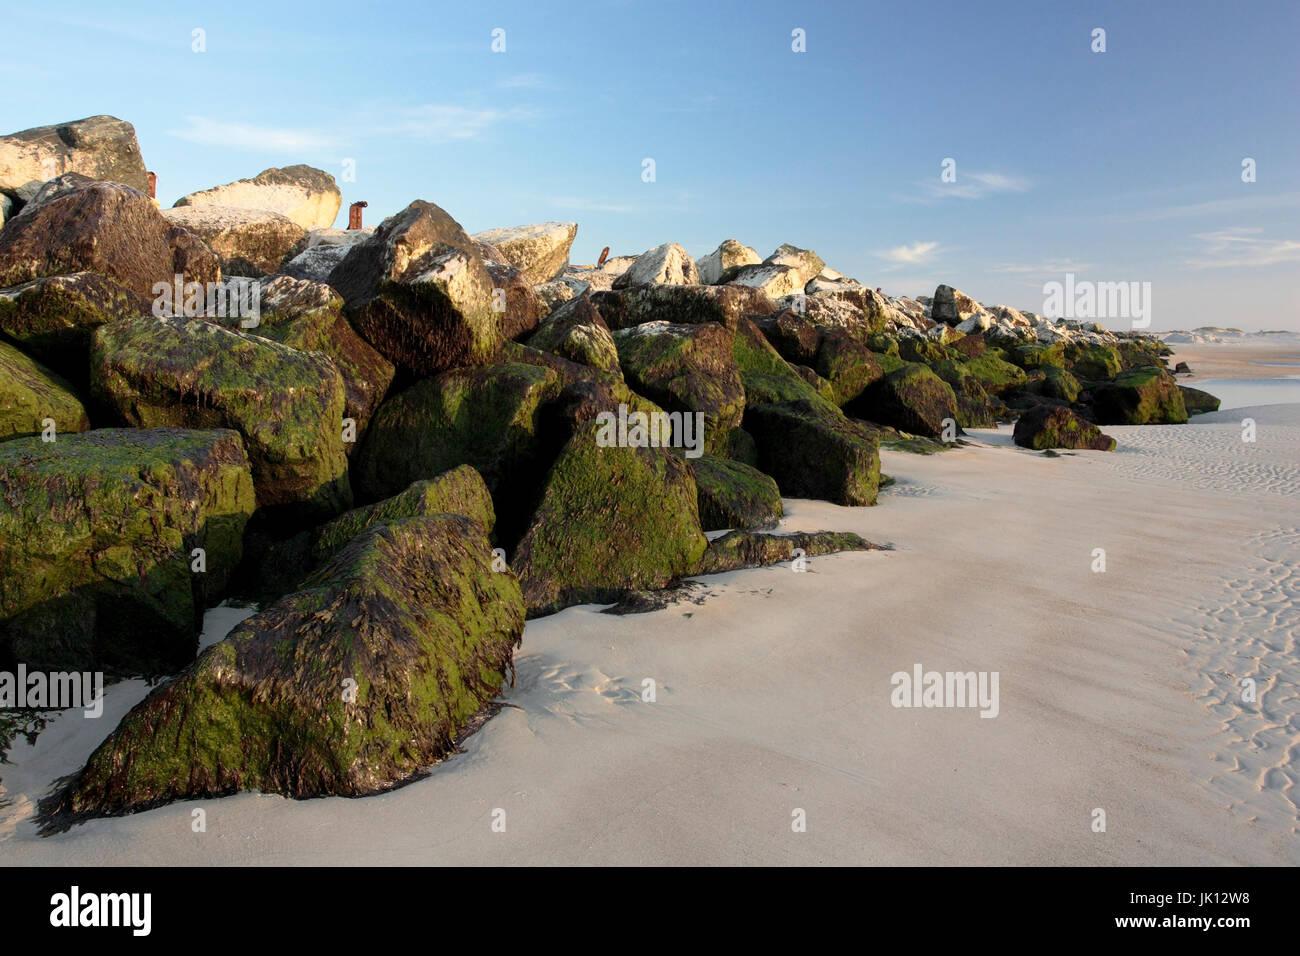 Breakwater on the dune Helgoland on the north beach, Wellenbrecher auf der Düne Helgoland am Nordstrand - Stock Image